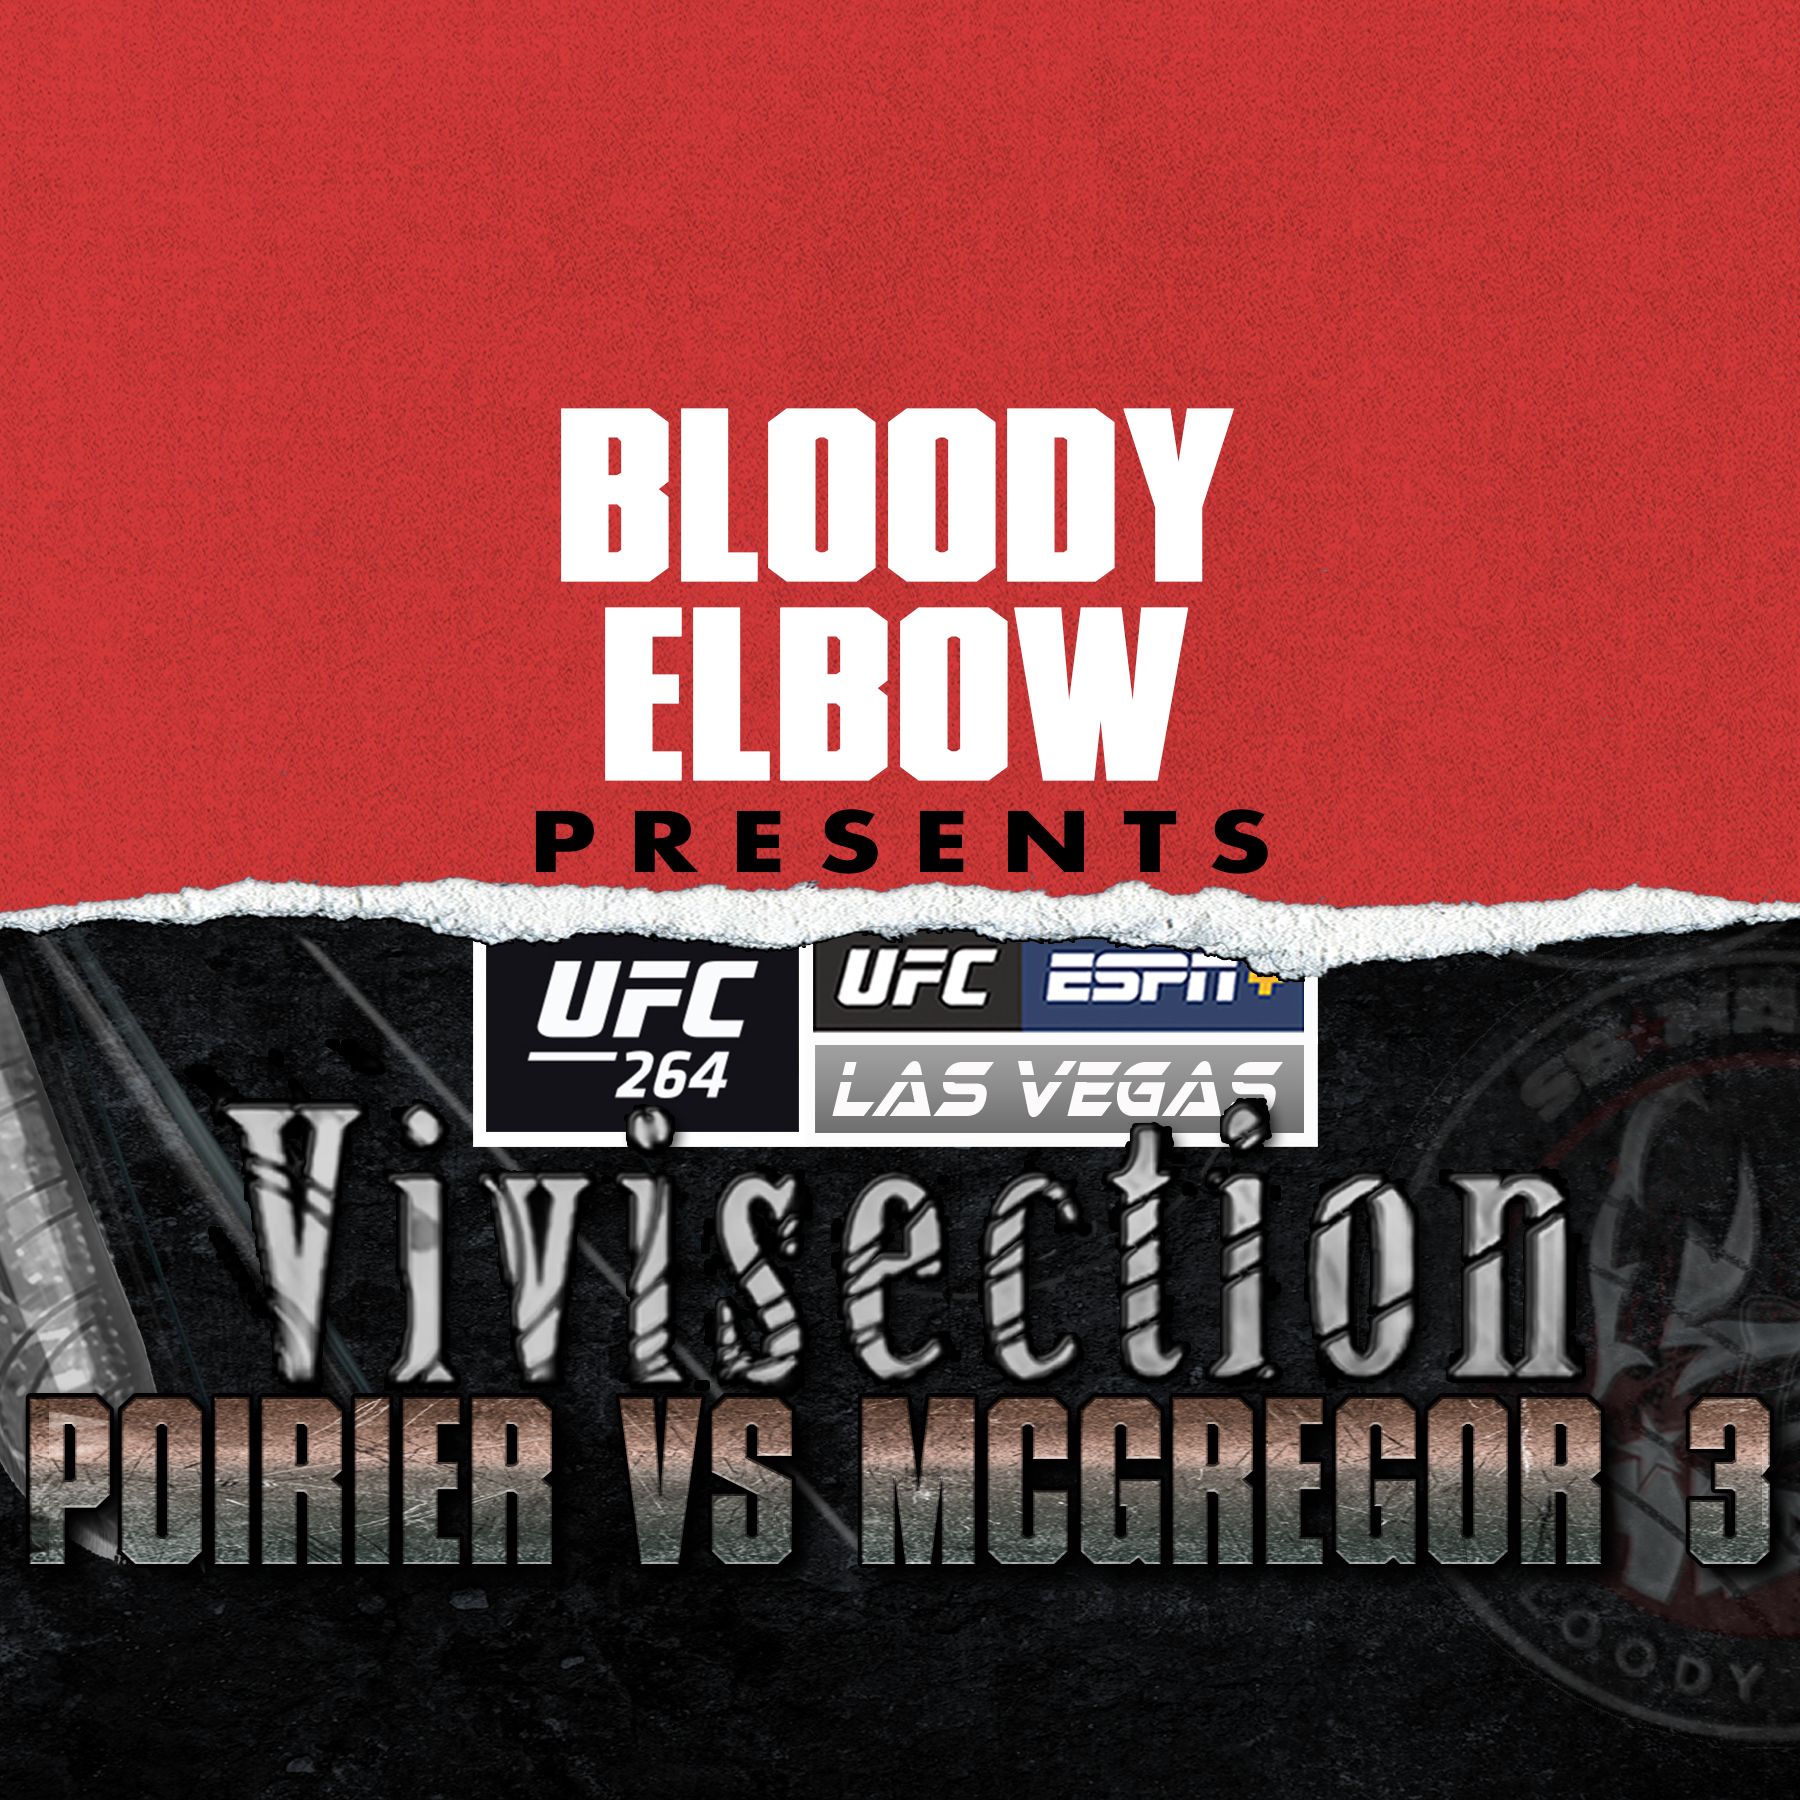 MMA VIVI, The MMA Vivisection, UFC Podcast, MMA Podcast, UFC 264, Poirier vs McGregor 3, UFC Preview, UFC Picks & Predictions, UFC Analysis, UFC Odds,